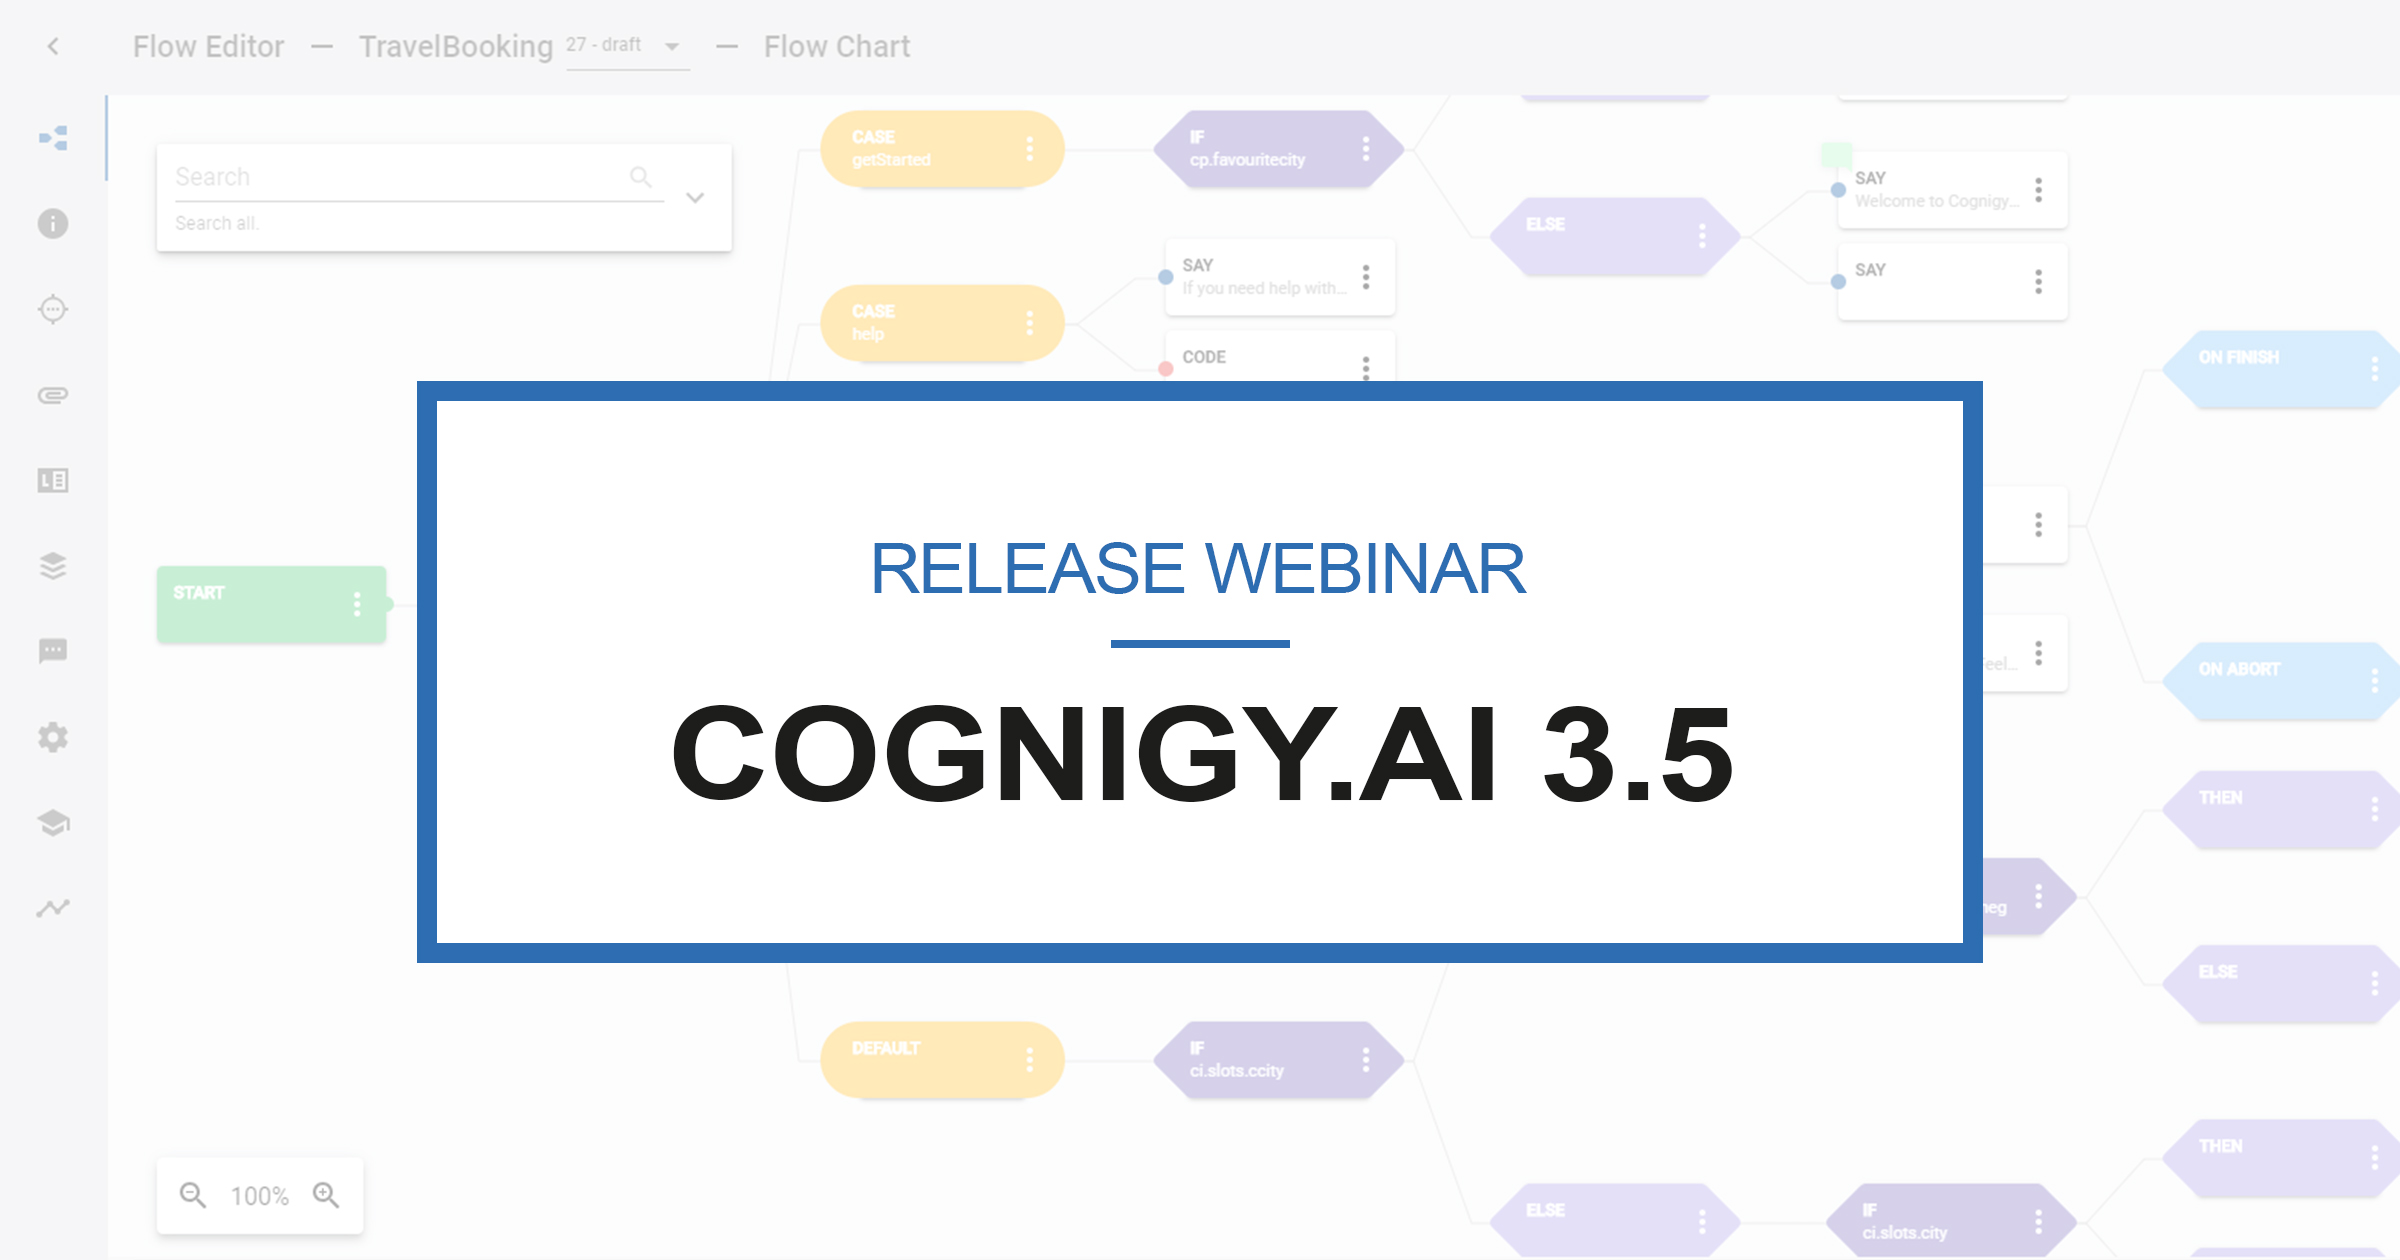 Cognigy.AI 3.5 - Release Webinar - Pre-Blog-Artikel